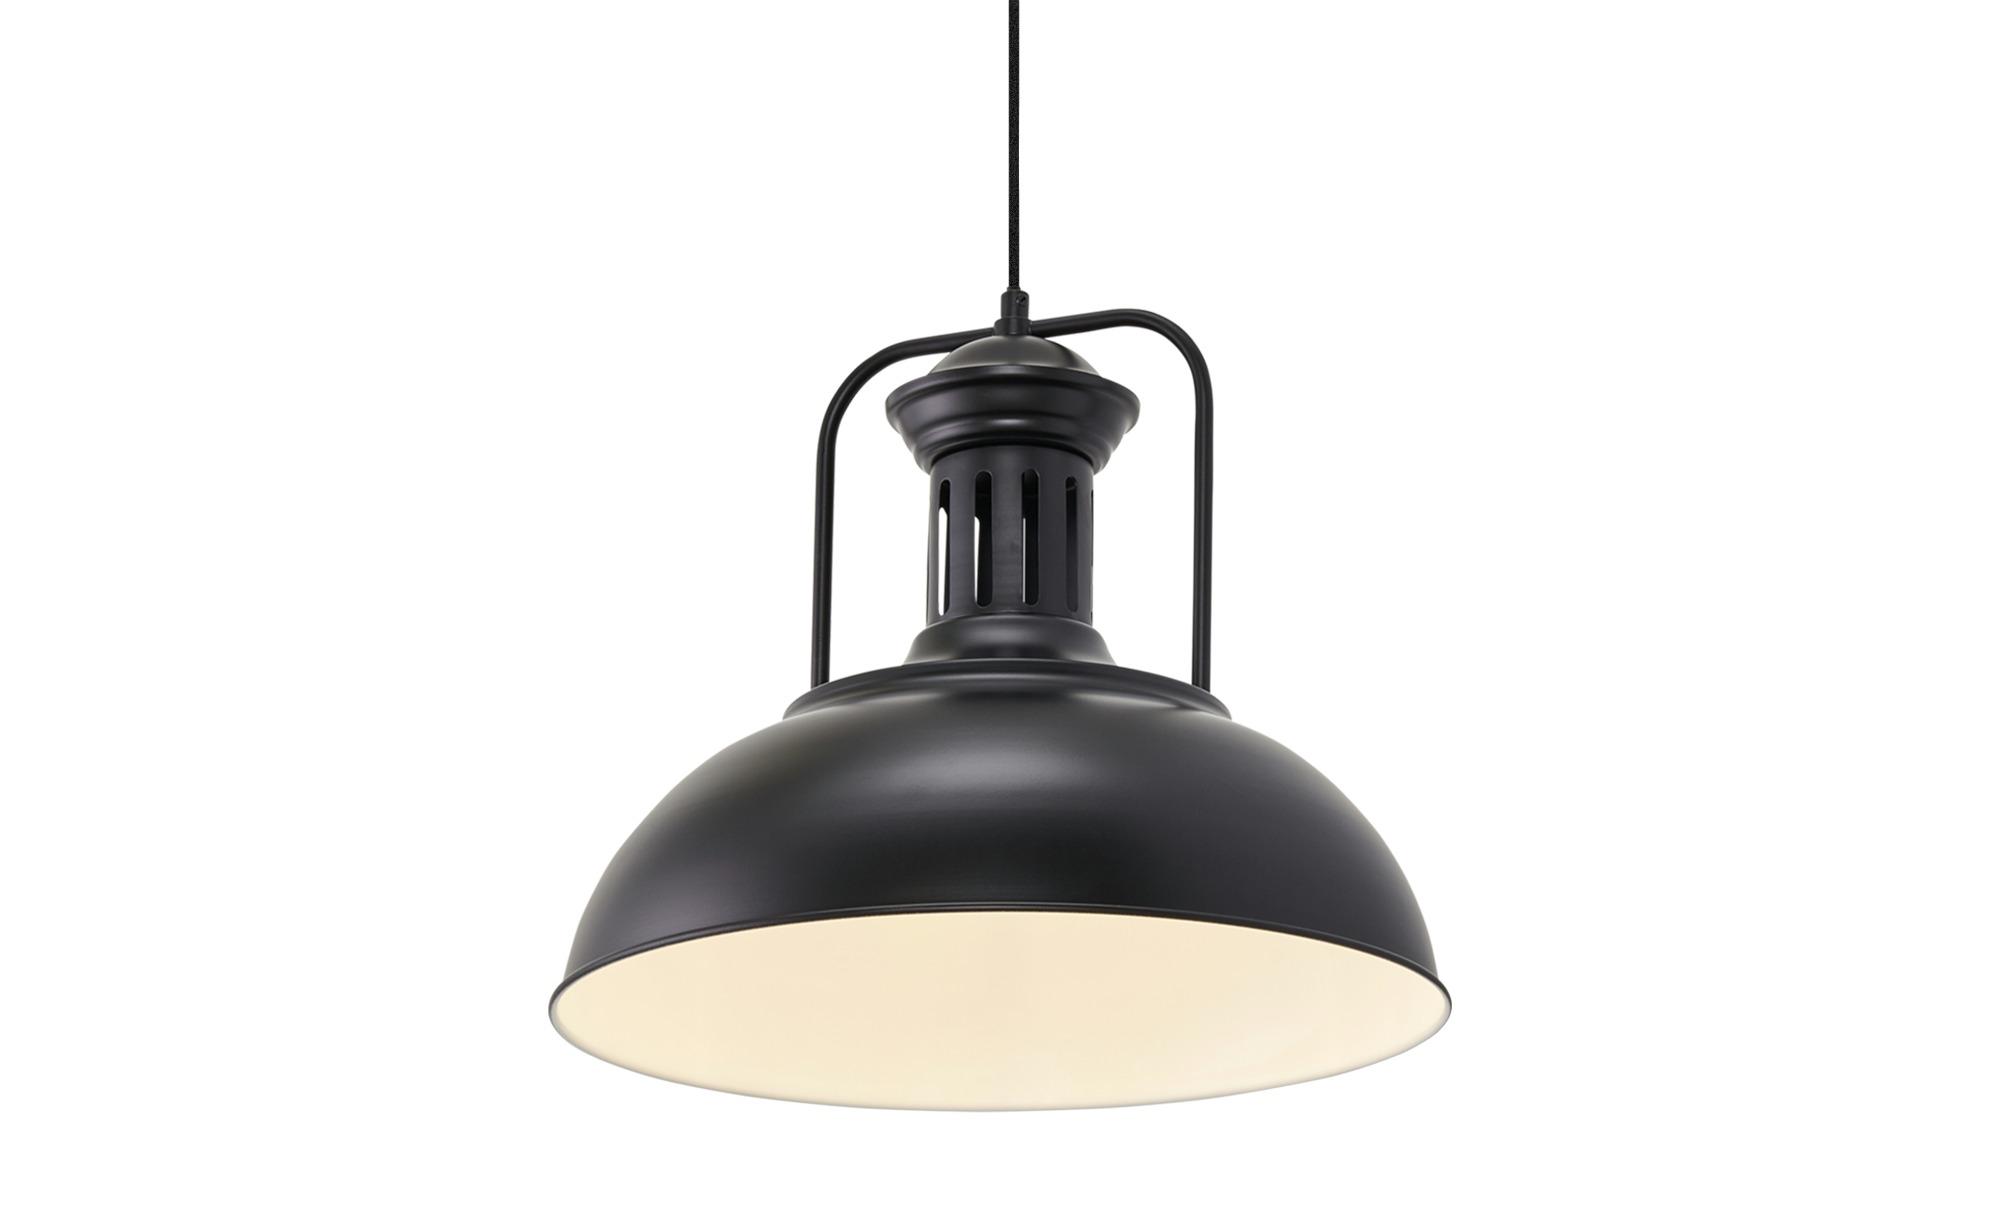 HOME STORY Pendelleuchte ¦ schwarz ¦ Maße (cm): H: 150 Ø: 41 Lampen & Leuchten > Innenleuchten > Pendelleuchten - Höffner